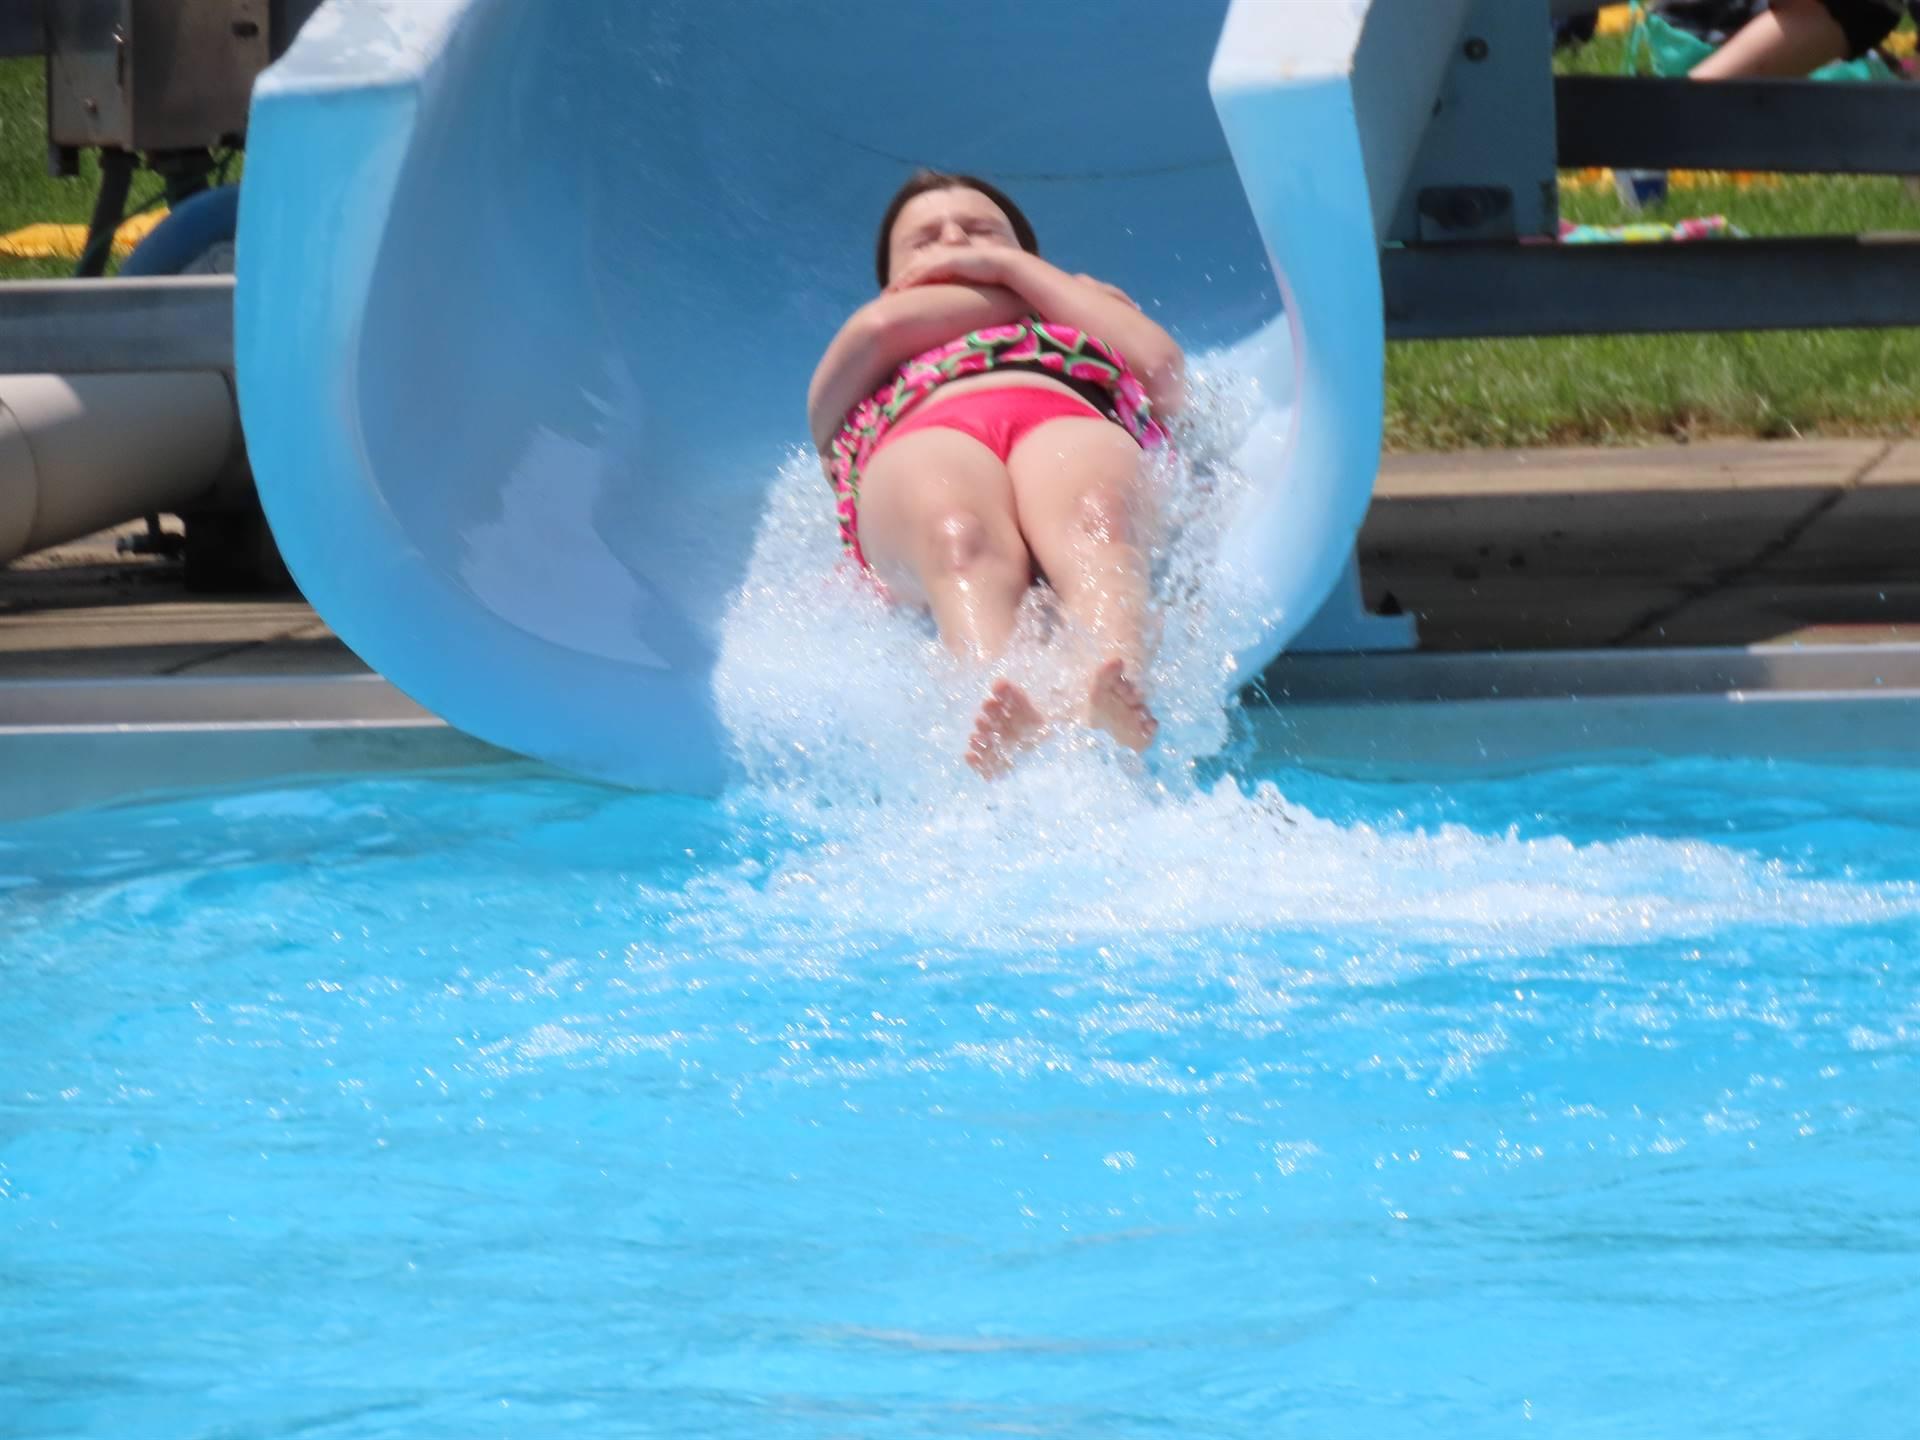 Kids sliding down pool slide into water